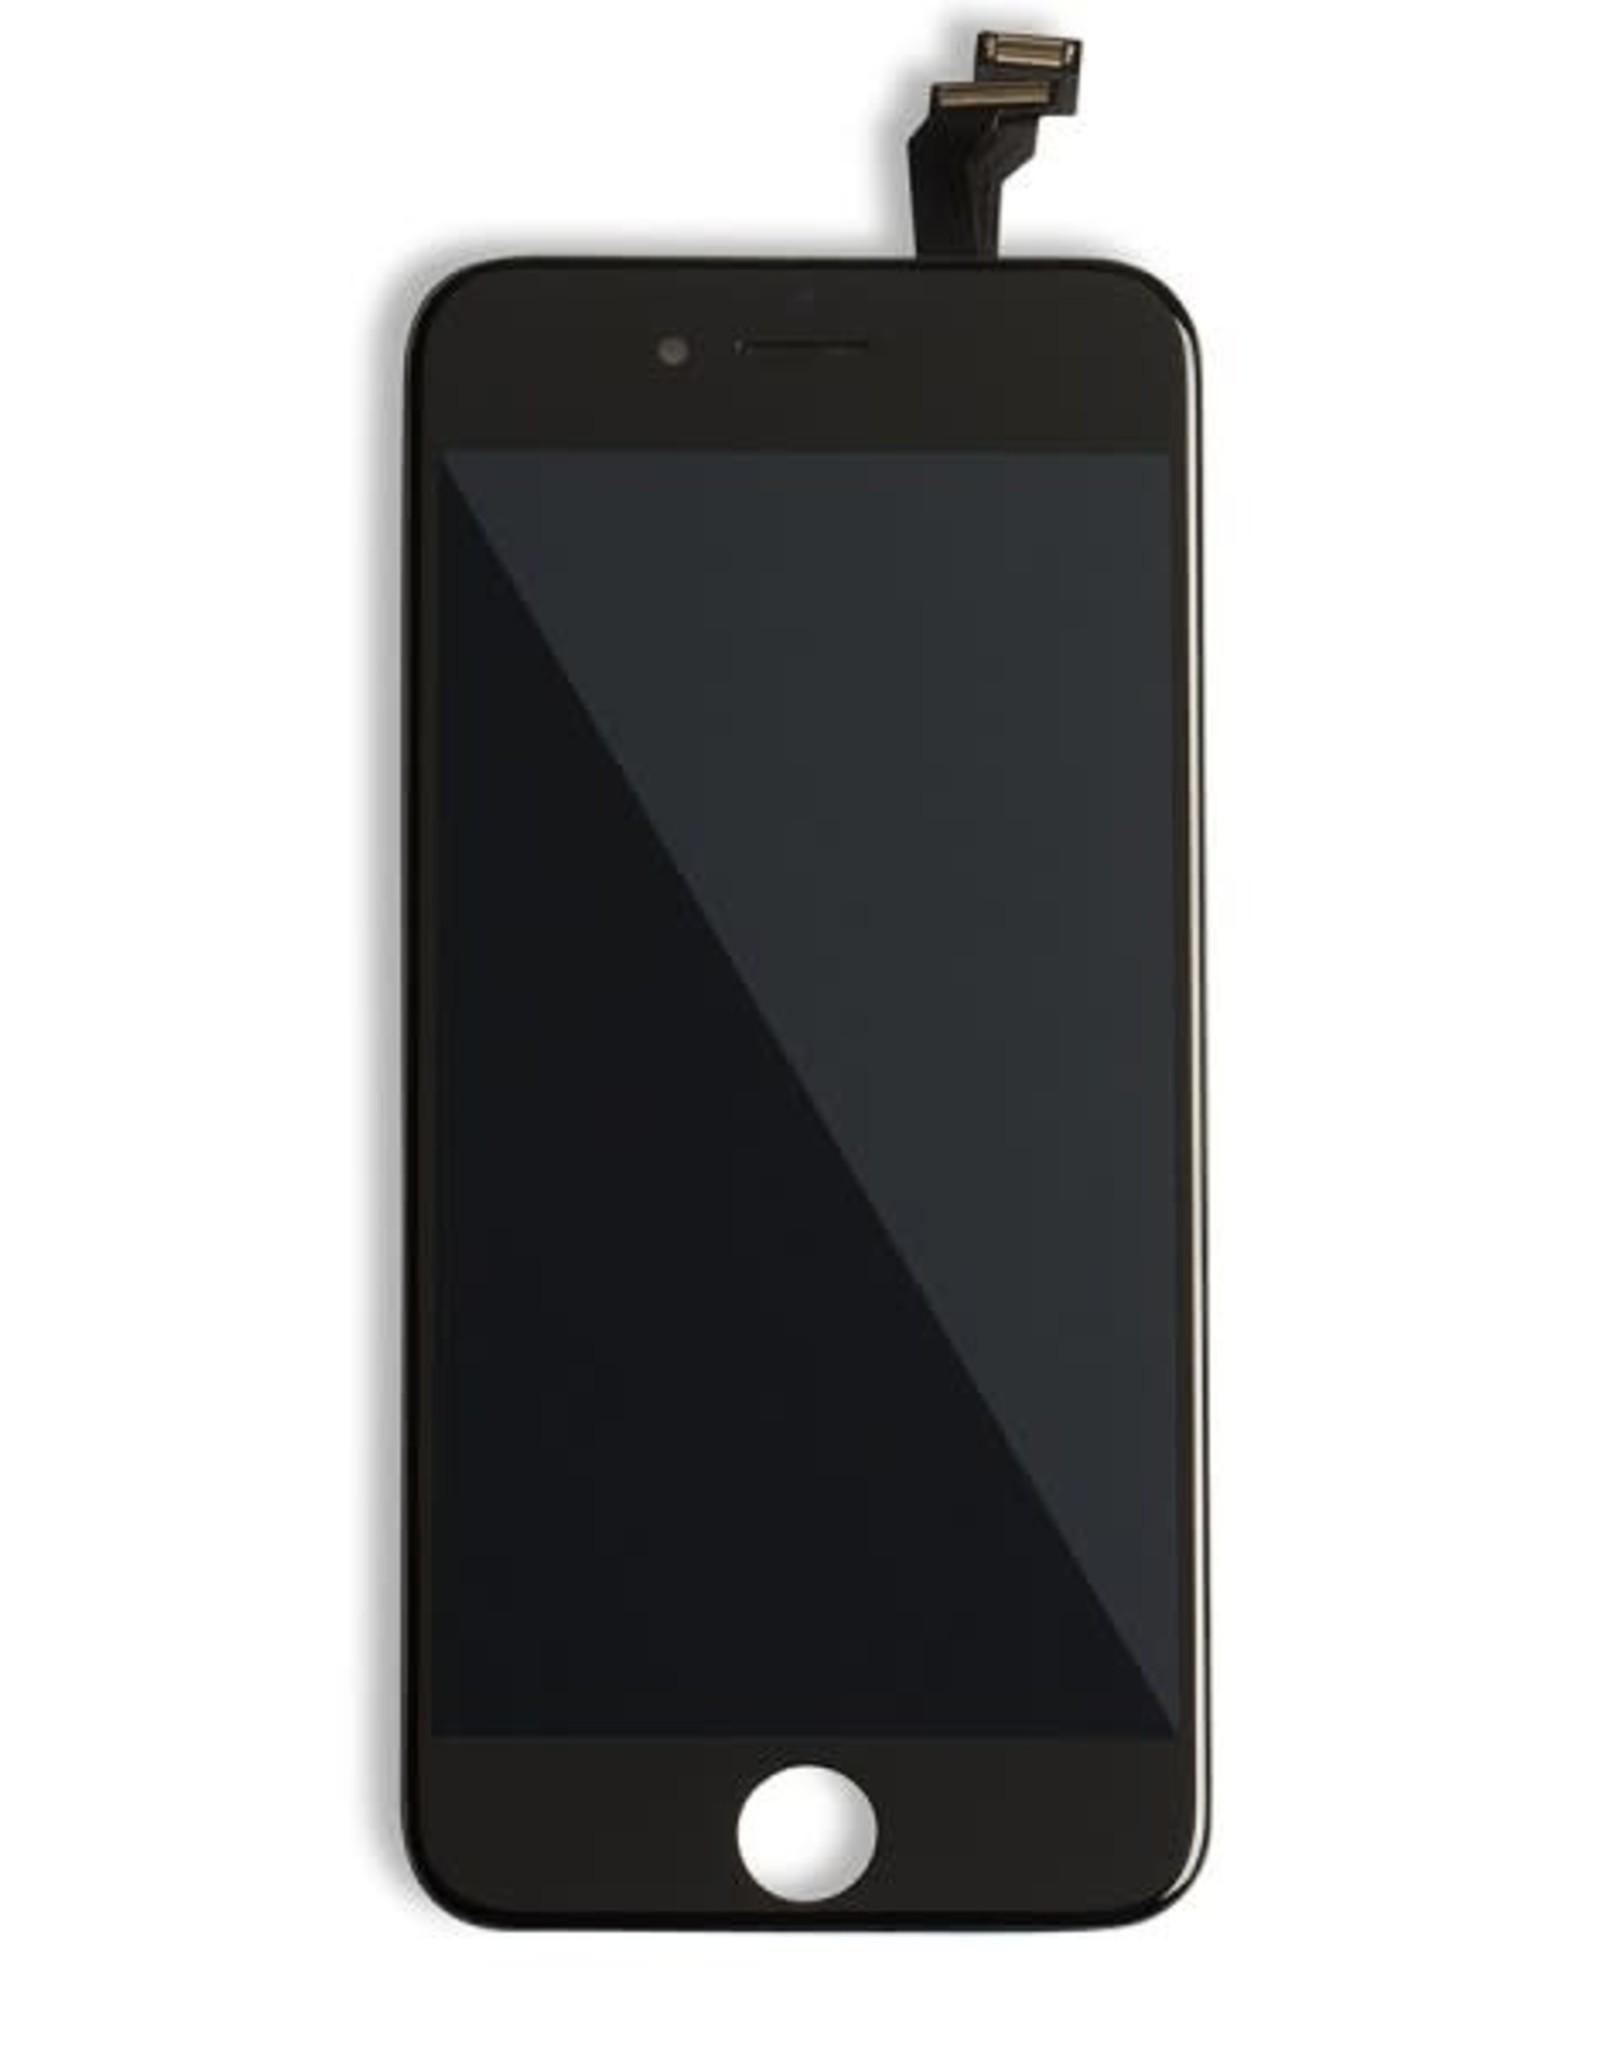 Apple iPhone 6 (Black) Screen Replacement OEM (LCD)